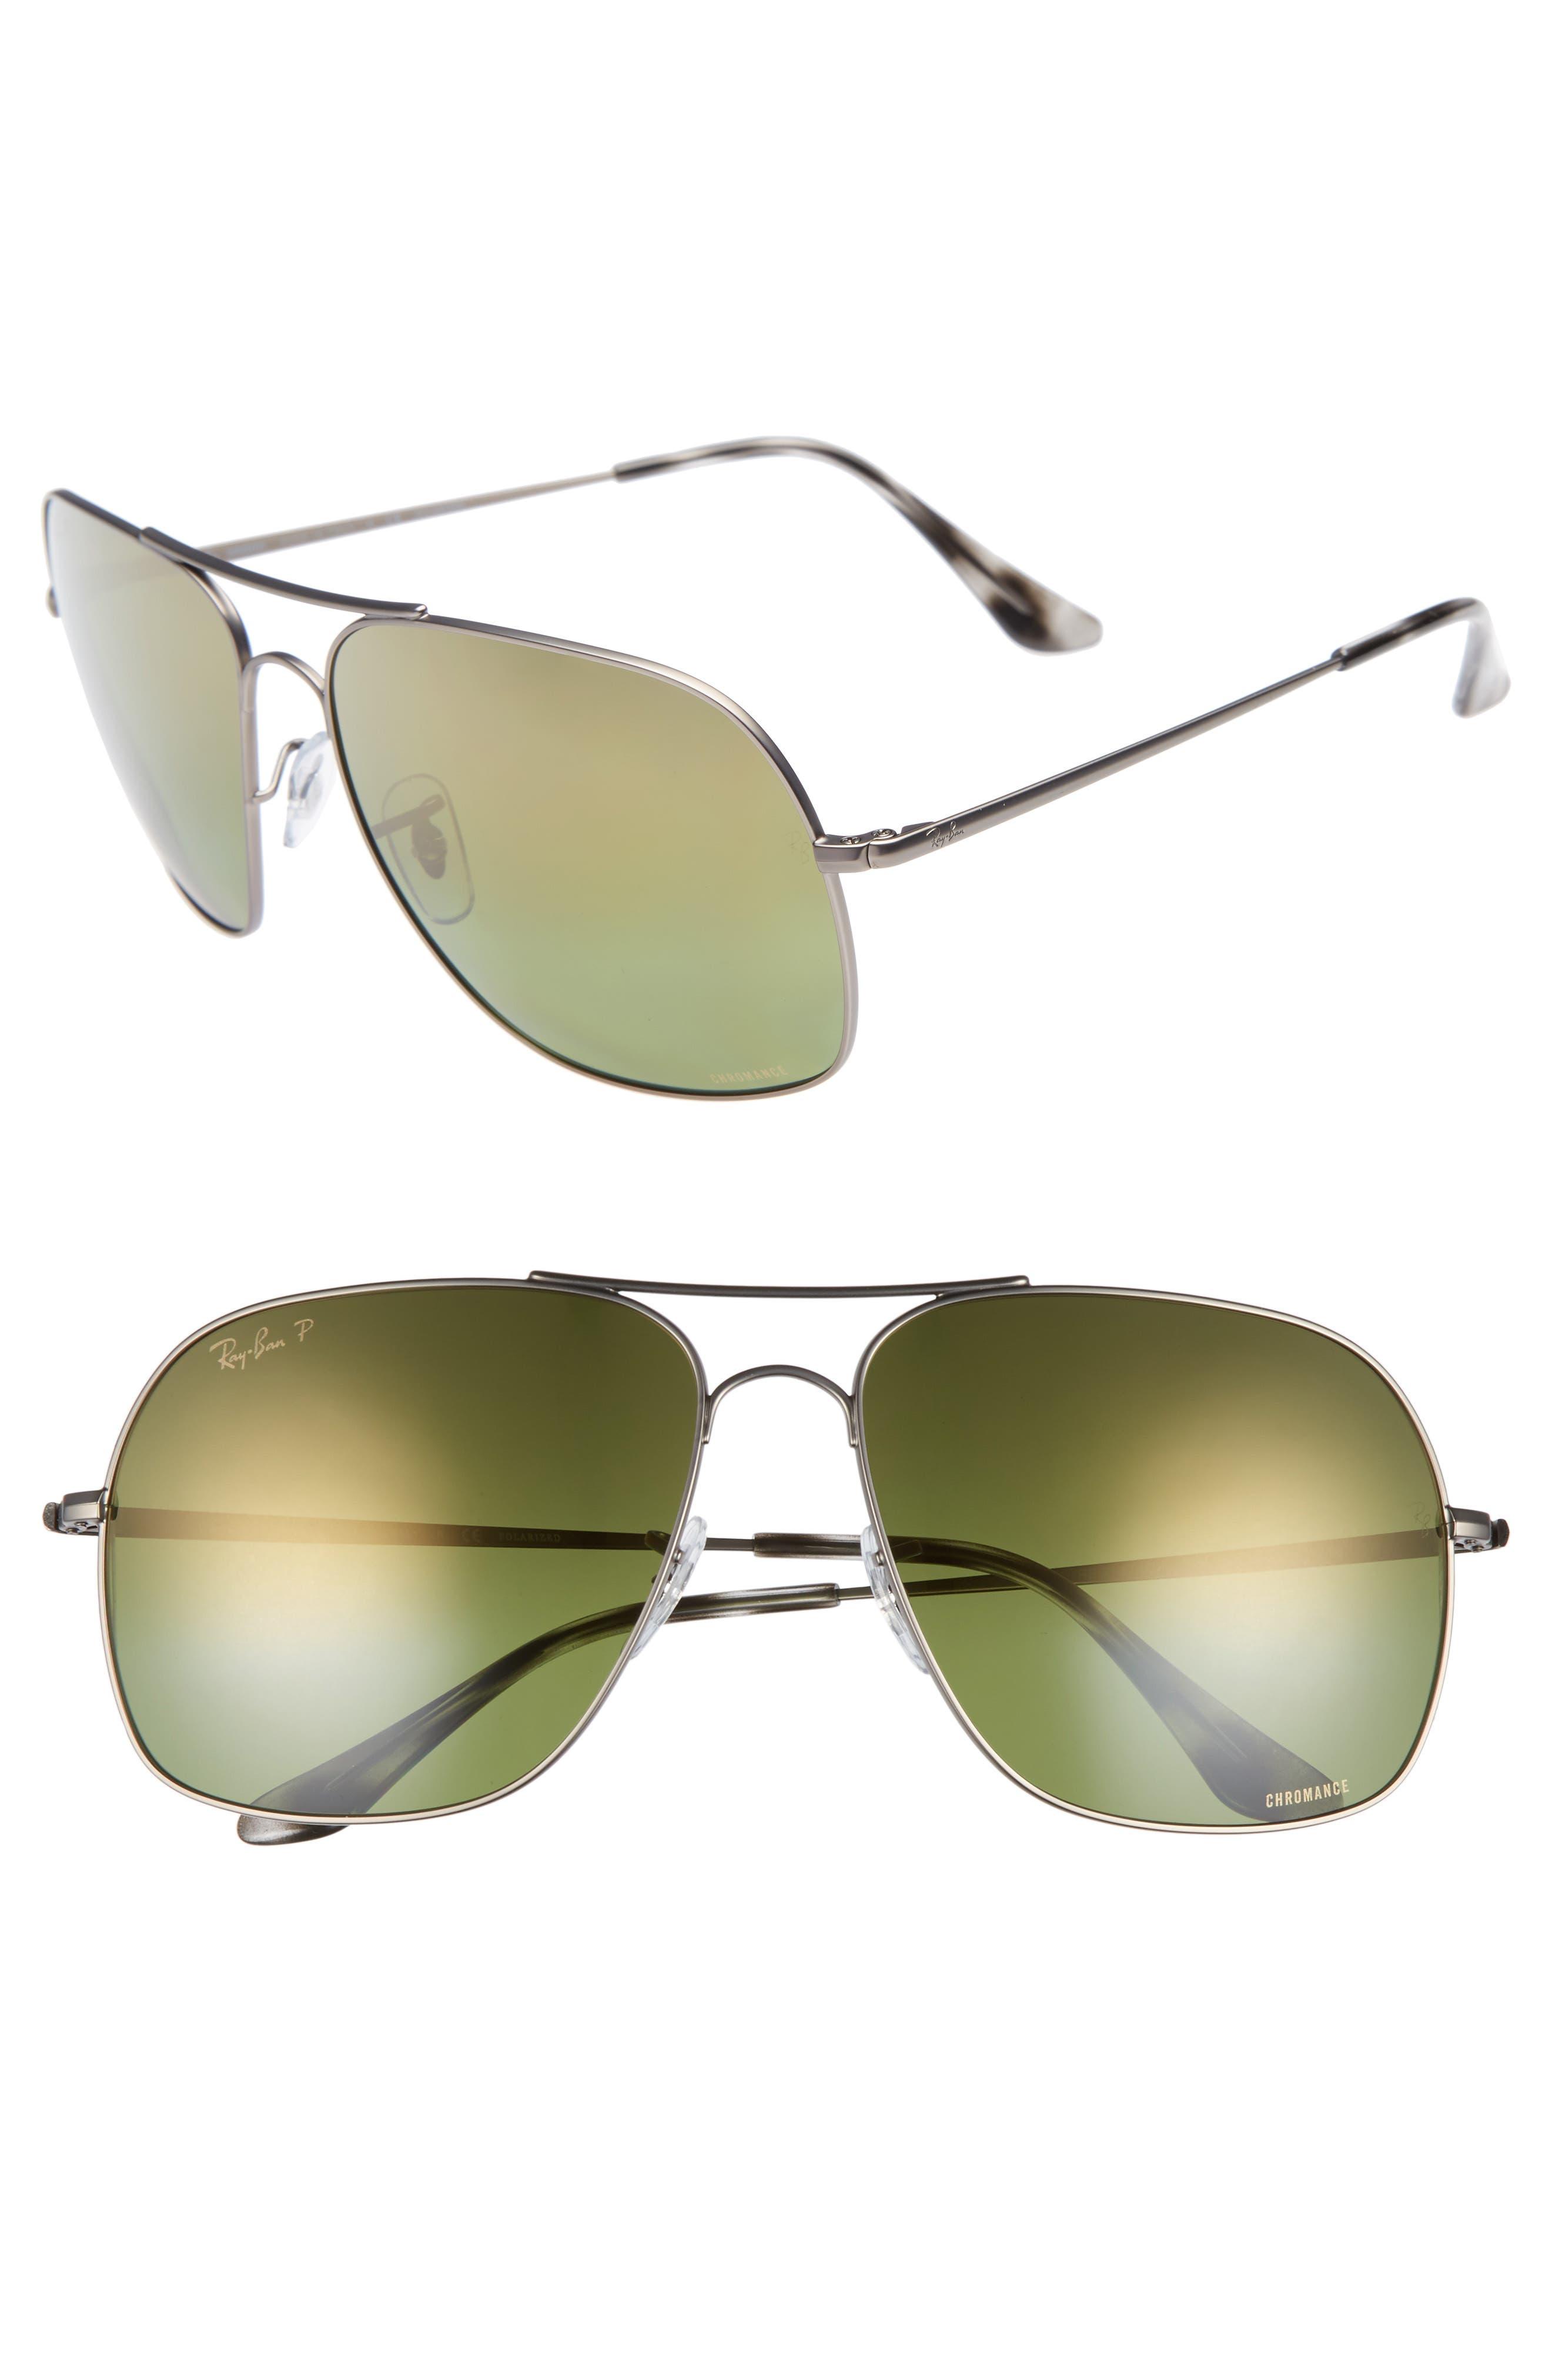 Ray-Ban Chromance 61mm Double Bridge Aviator Sunglasses